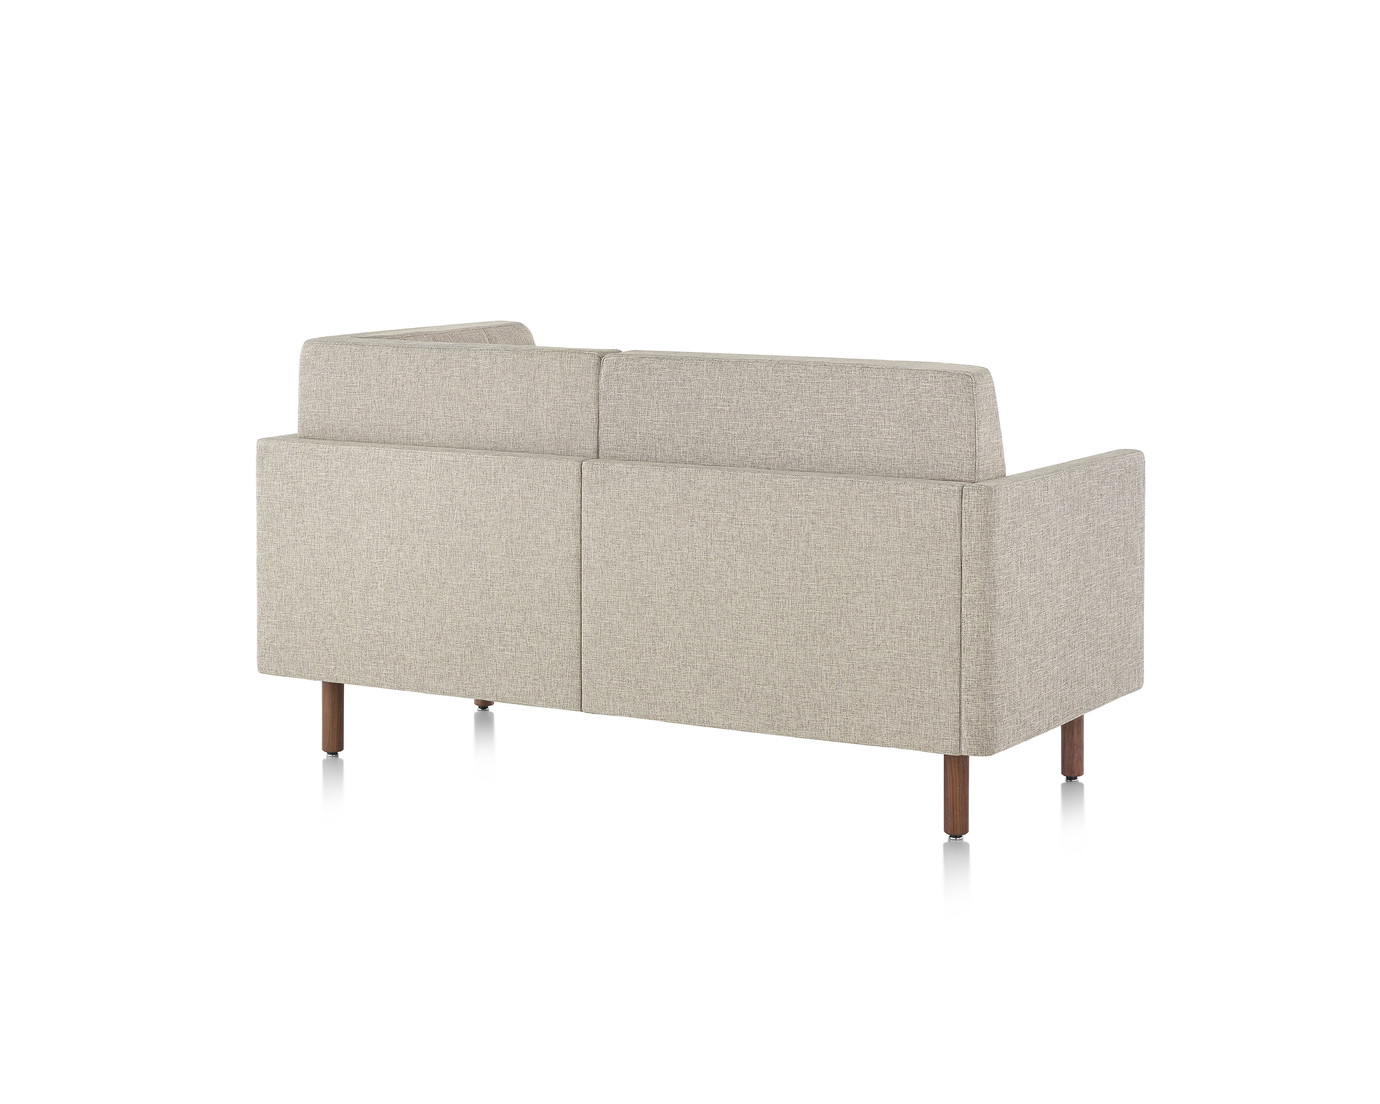 2-Silla-Lounge-Tuxedo-1-1380